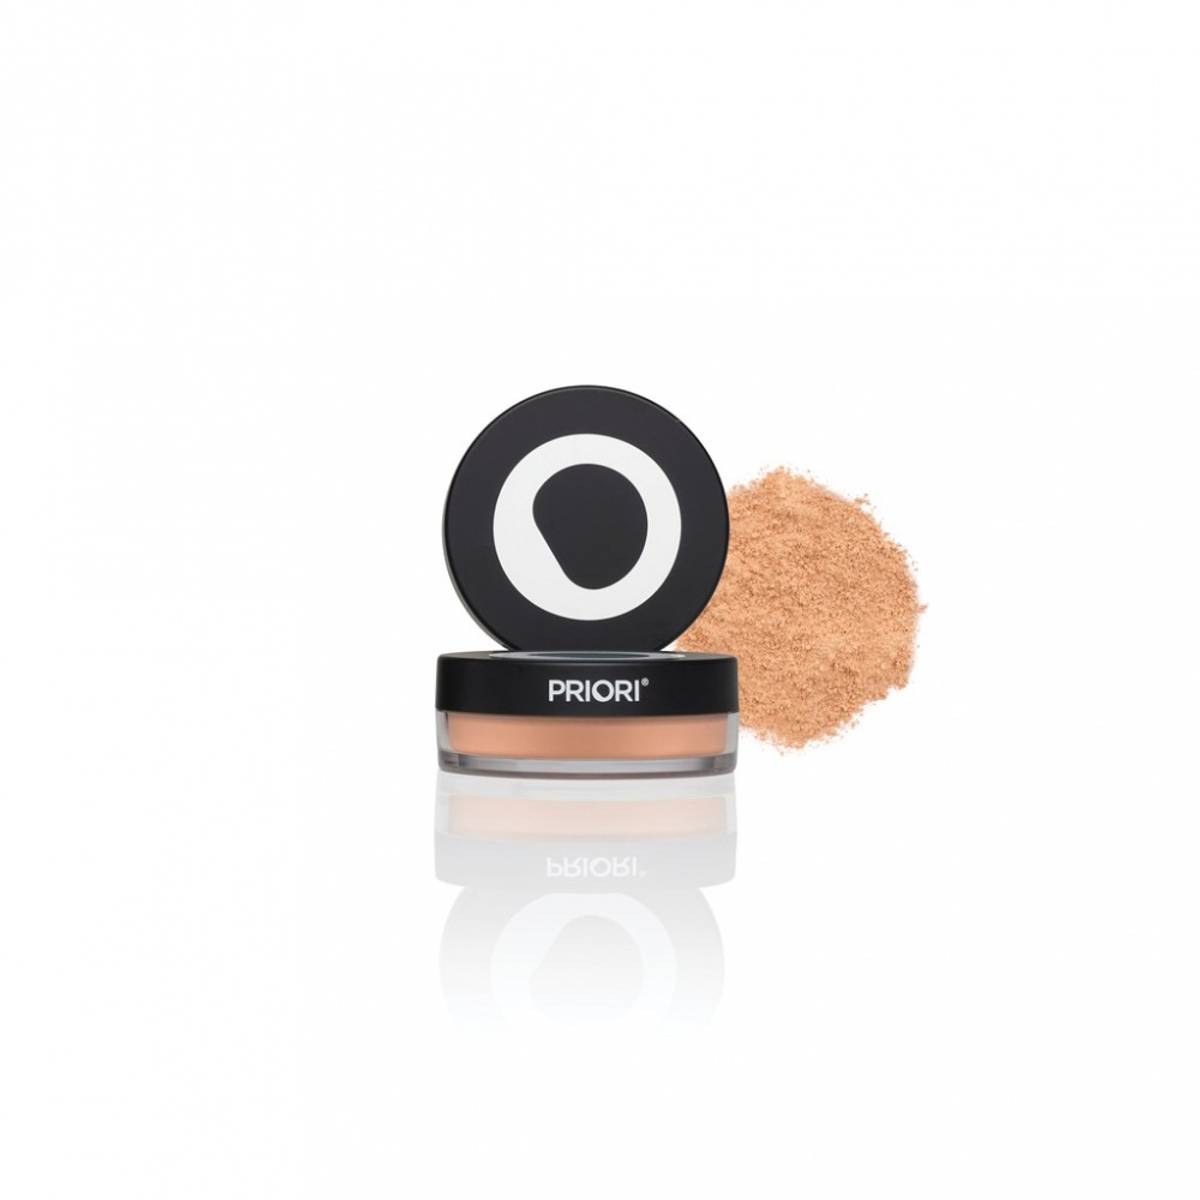 PRIORI Mineral Skincare Powder SPF25 Light Ivory fx352